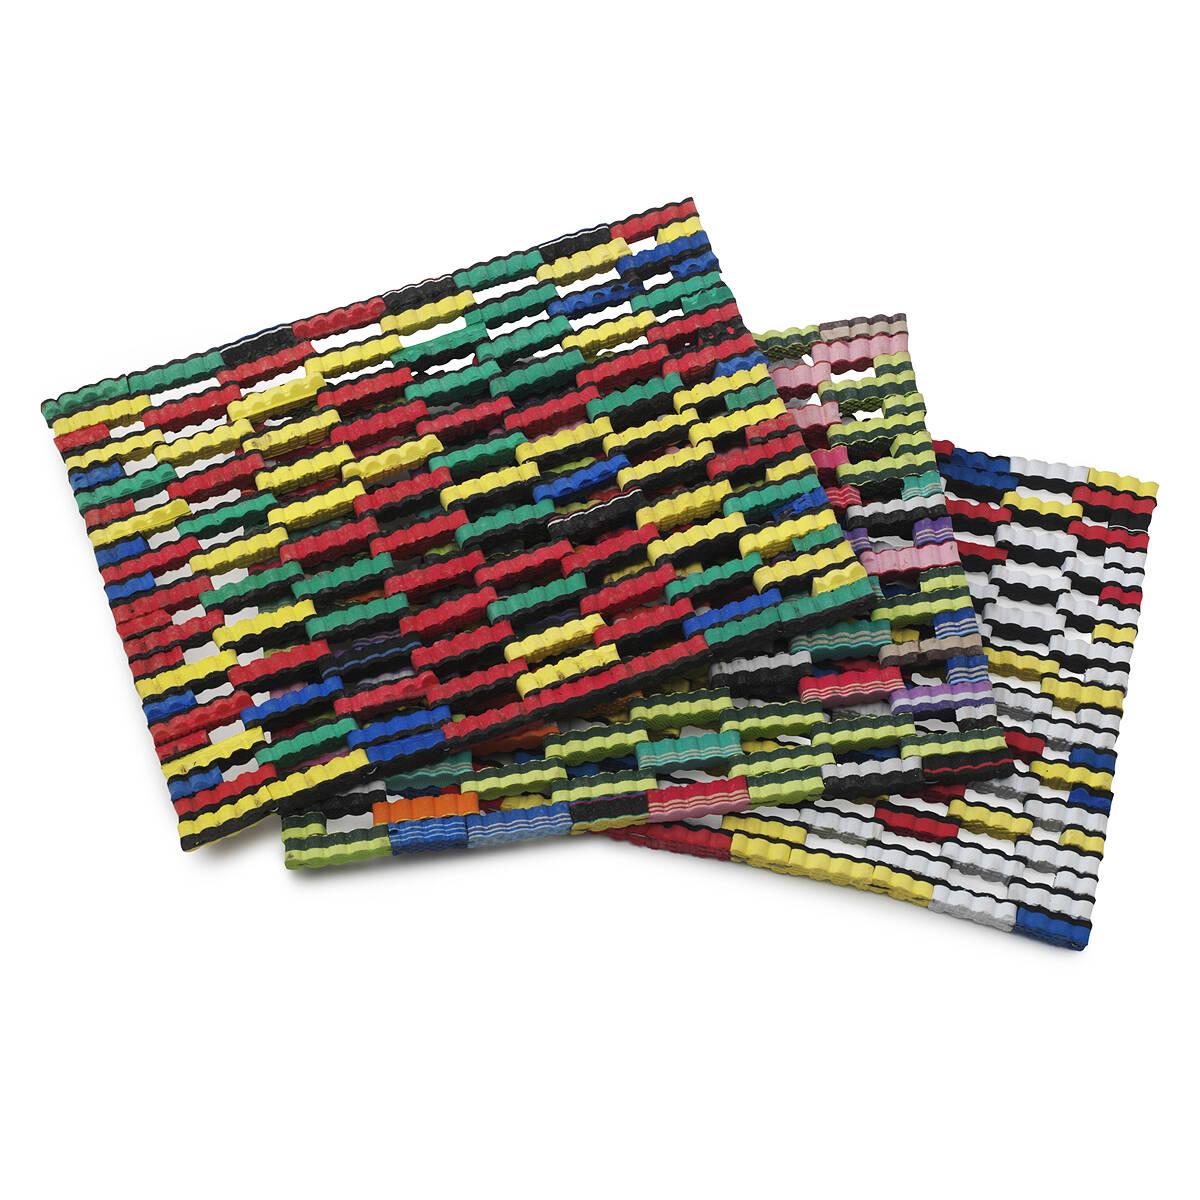 Flip Flop Mat   Recycled Rubber Doormat, Welcome Mat   UncommonGoods